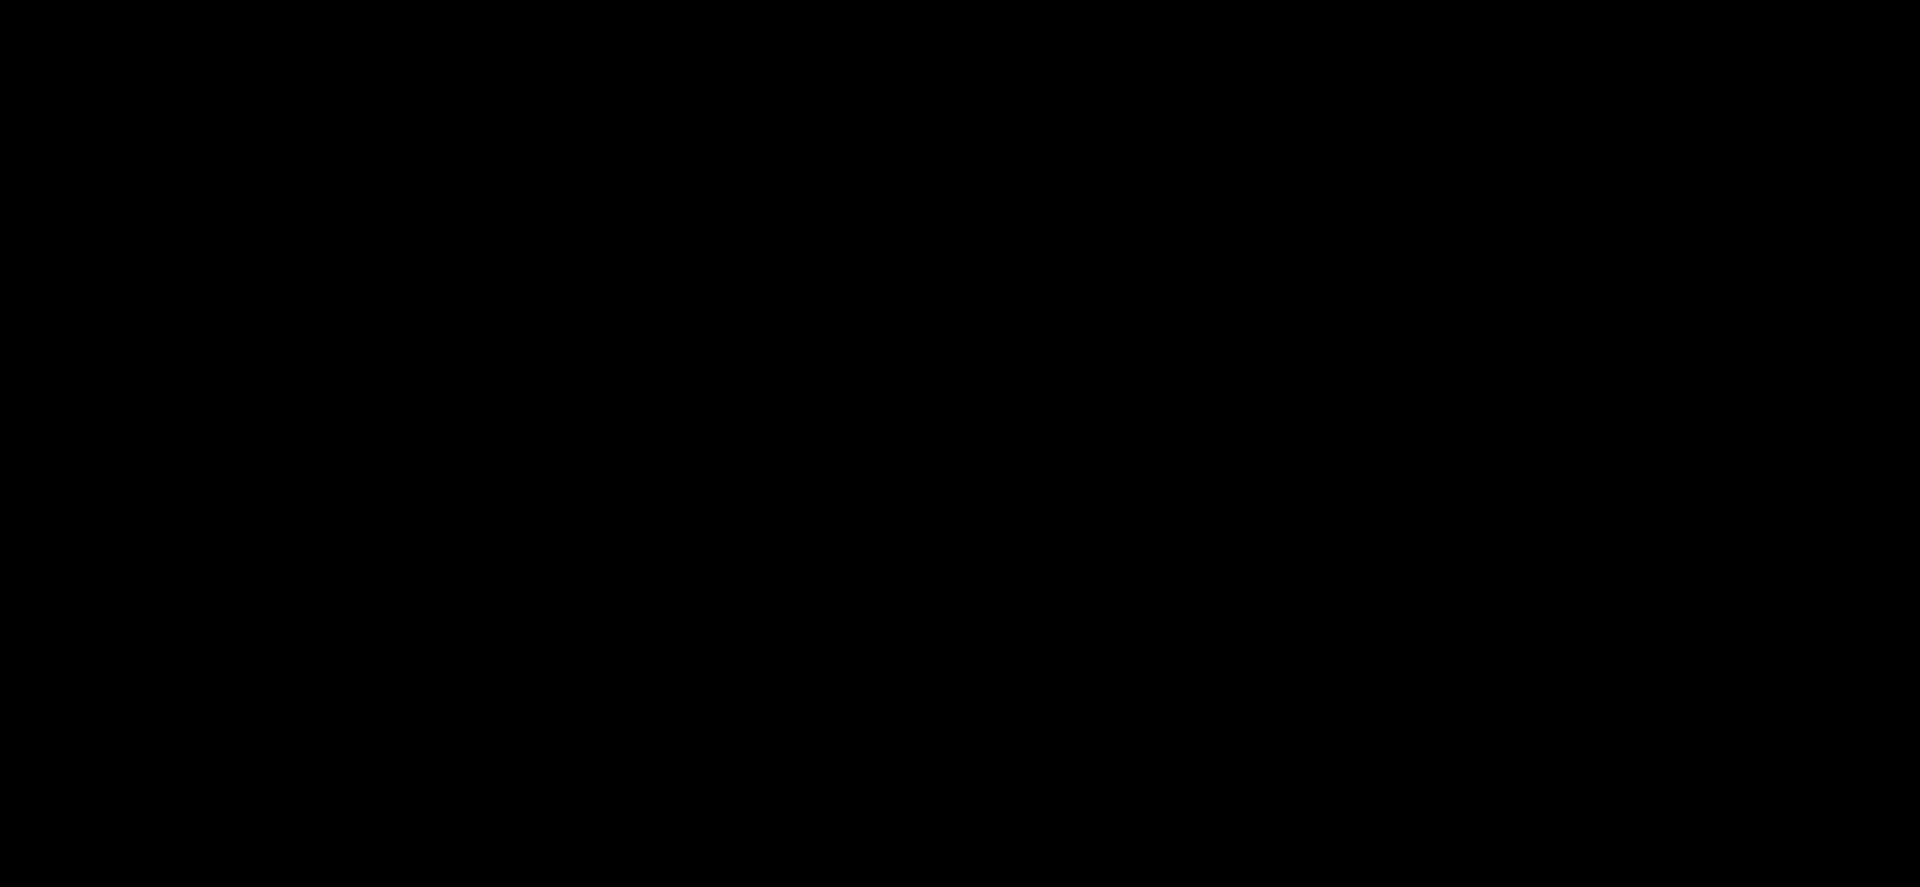 glycerine acetate auto electrical wiring diagram